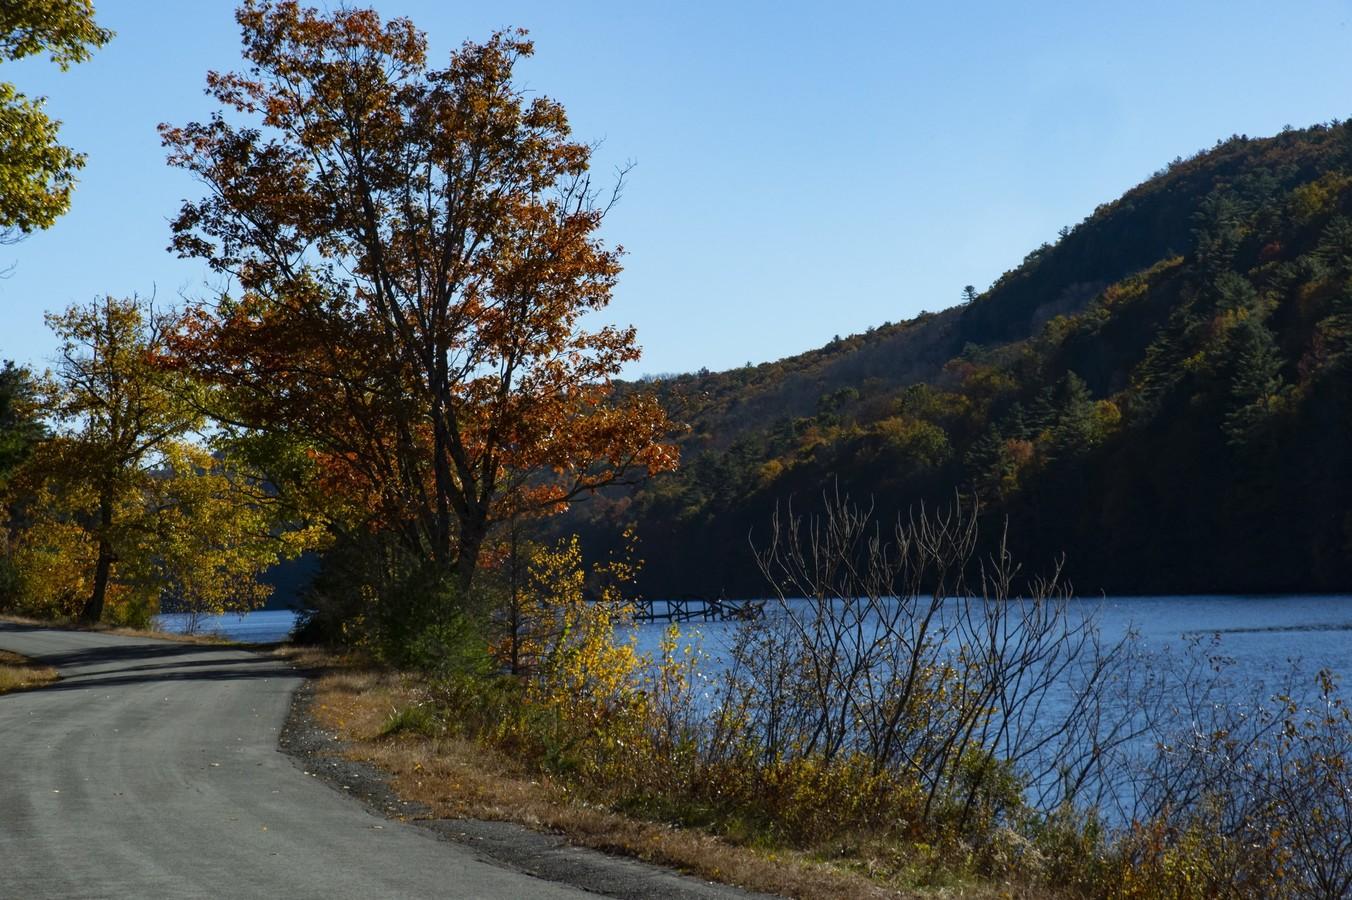 scenic Catskills drive along river